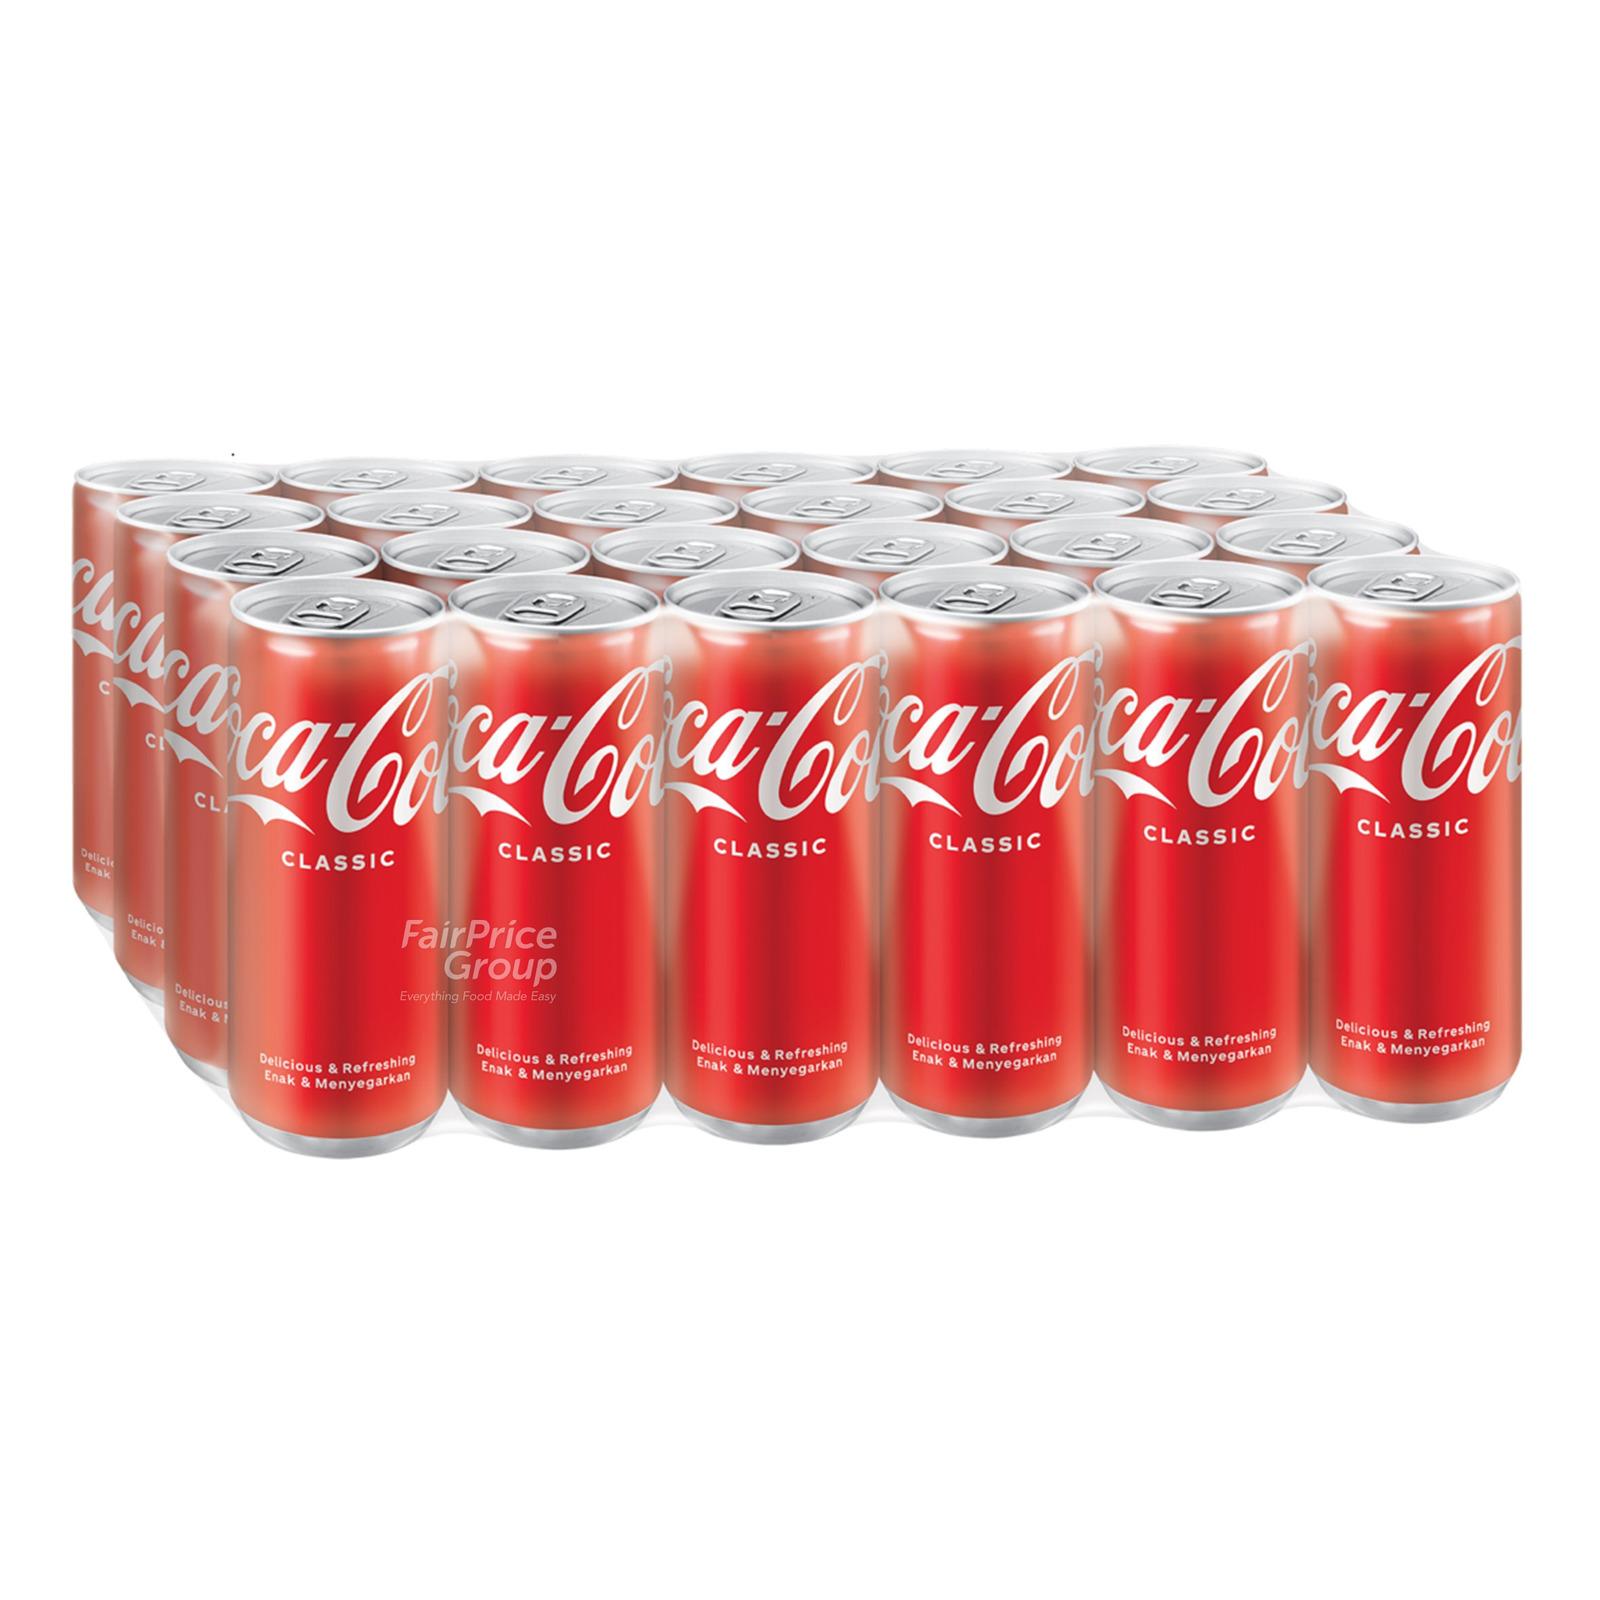 Coca-Cola Can Drink - Classic (Slim)